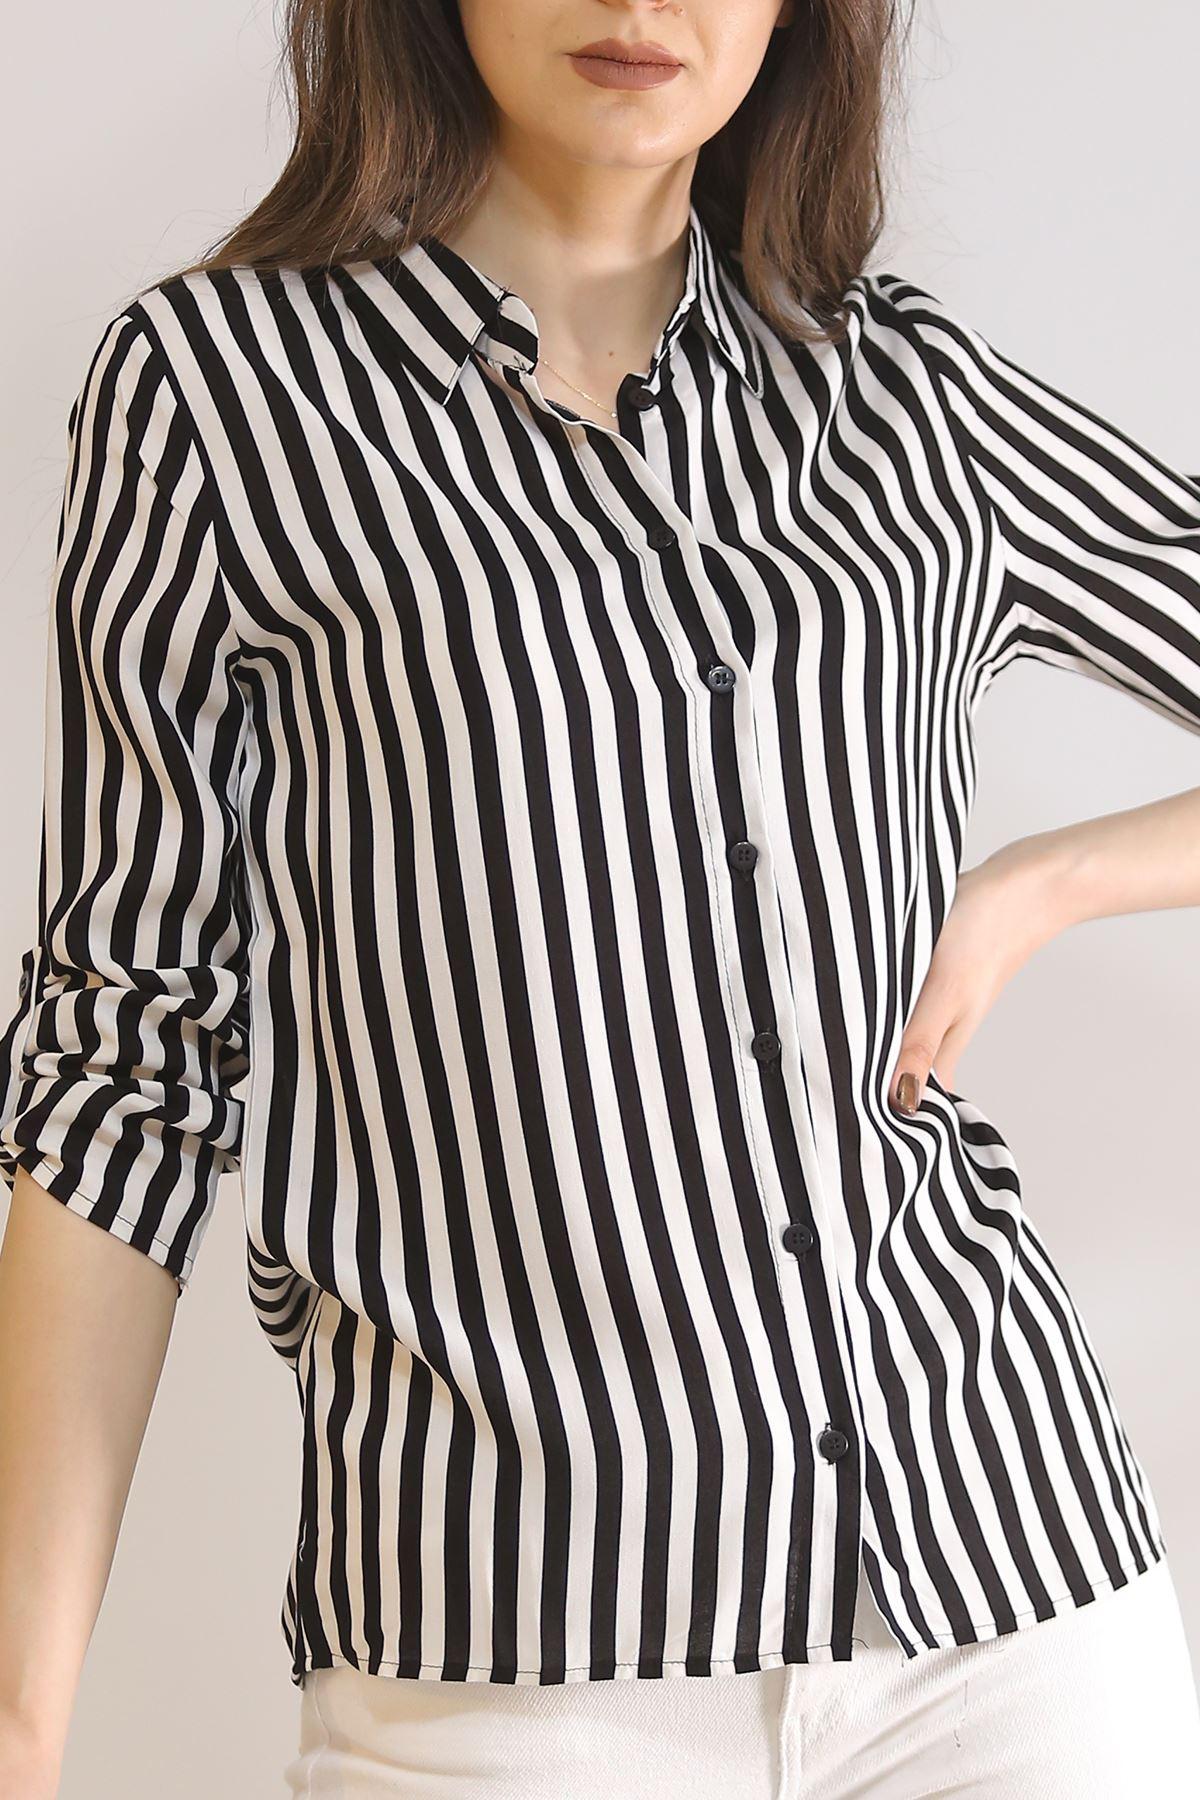 Desenli Gömlek Siyahçizgili - 5087.128.